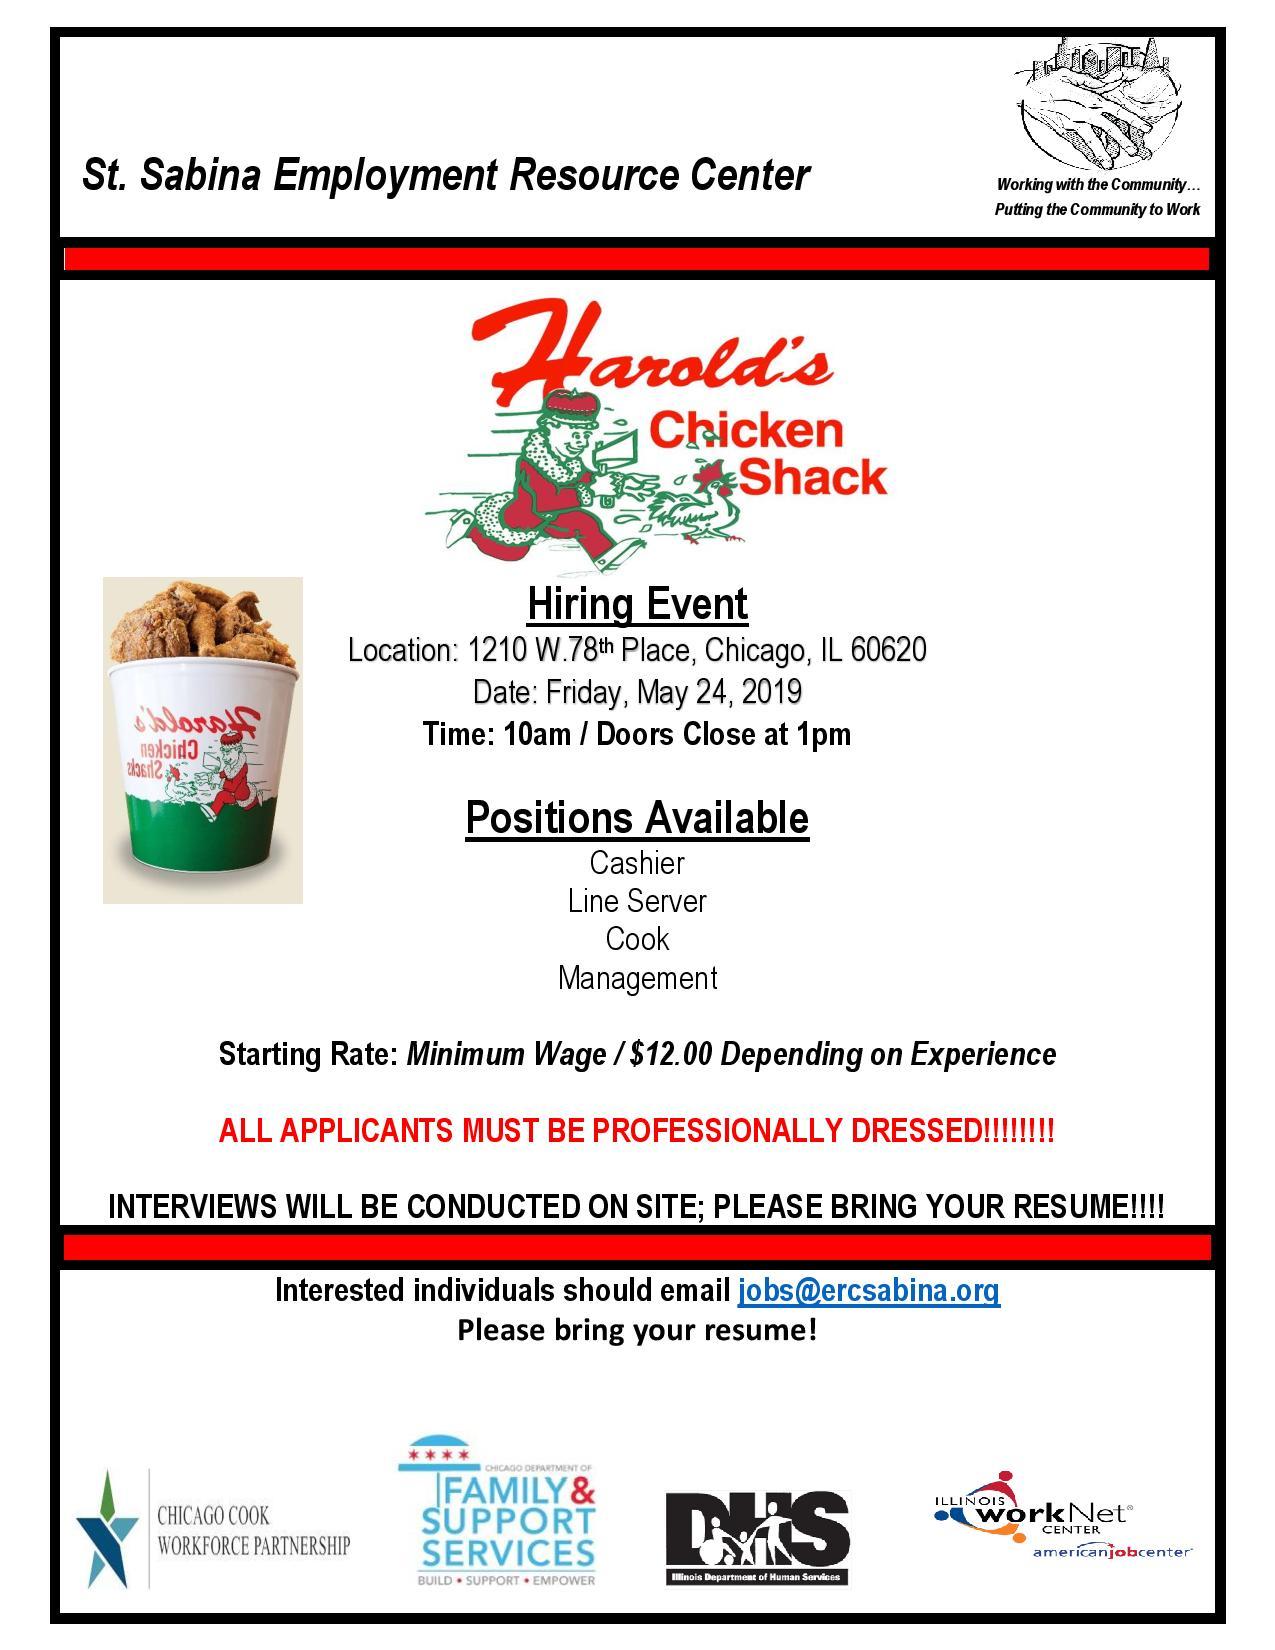 Harolds Chicken-page-001.jpg